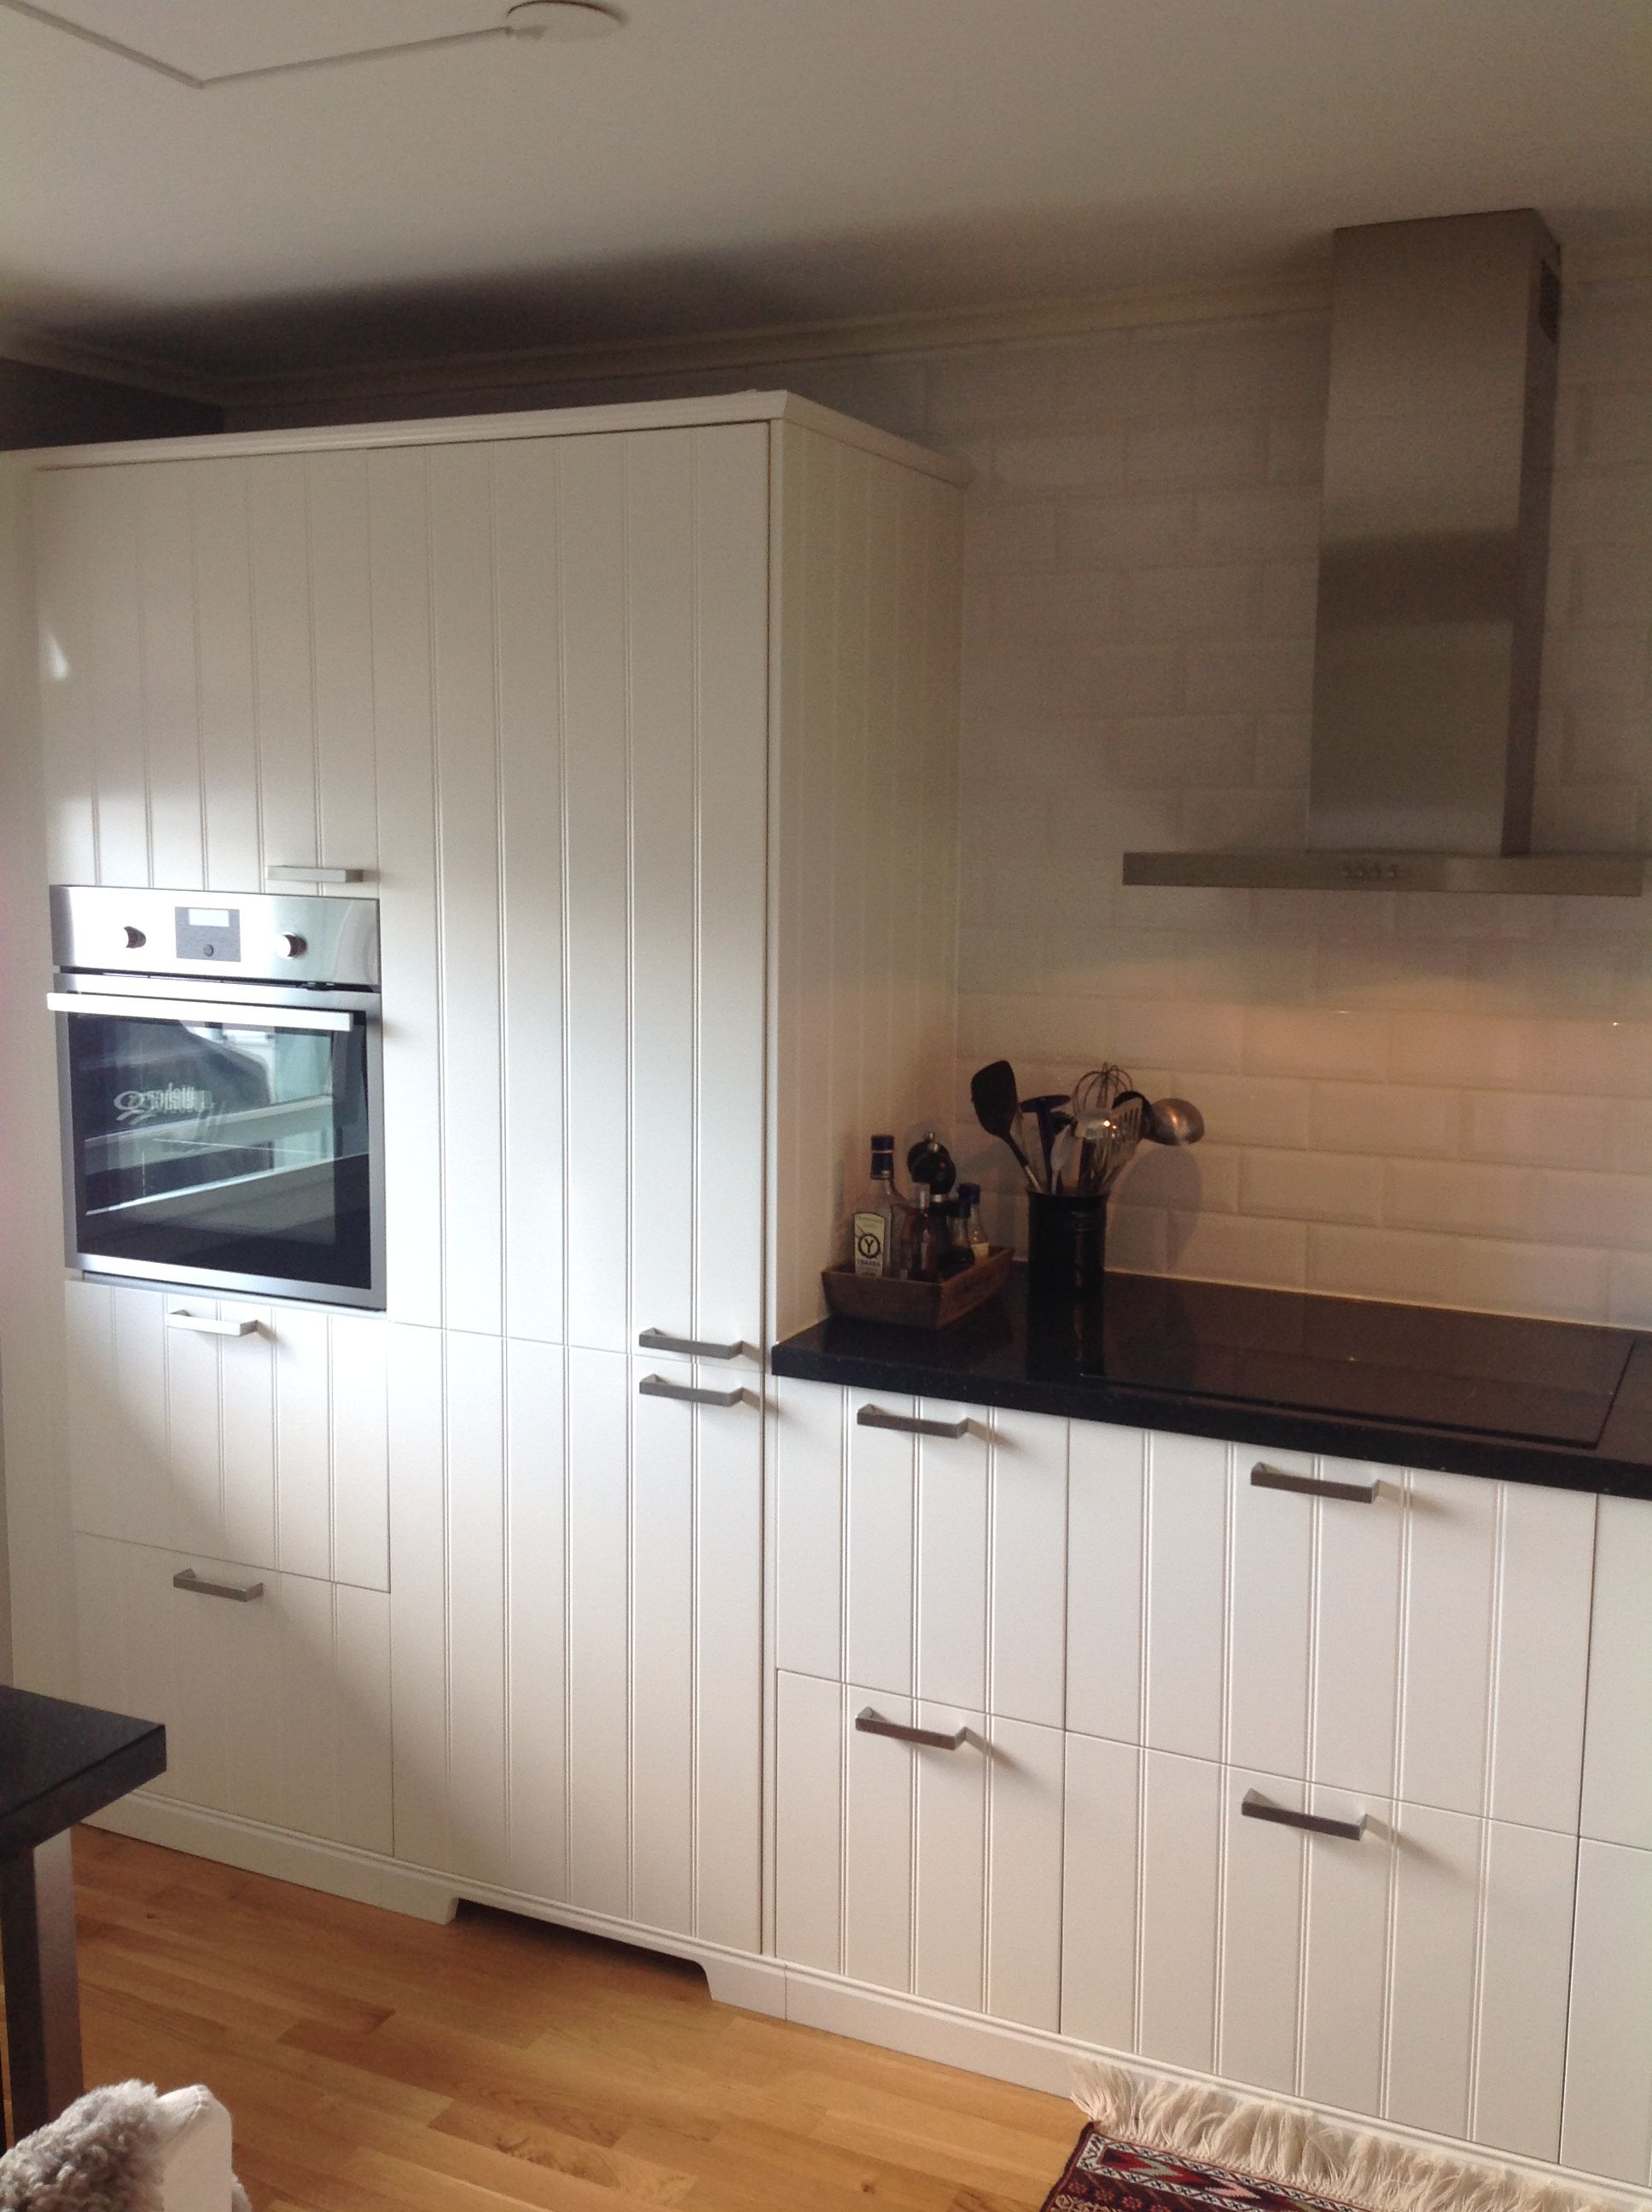 ikea hittarp kitchen country cocina ikea cocinas ikea. Black Bedroom Furniture Sets. Home Design Ideas